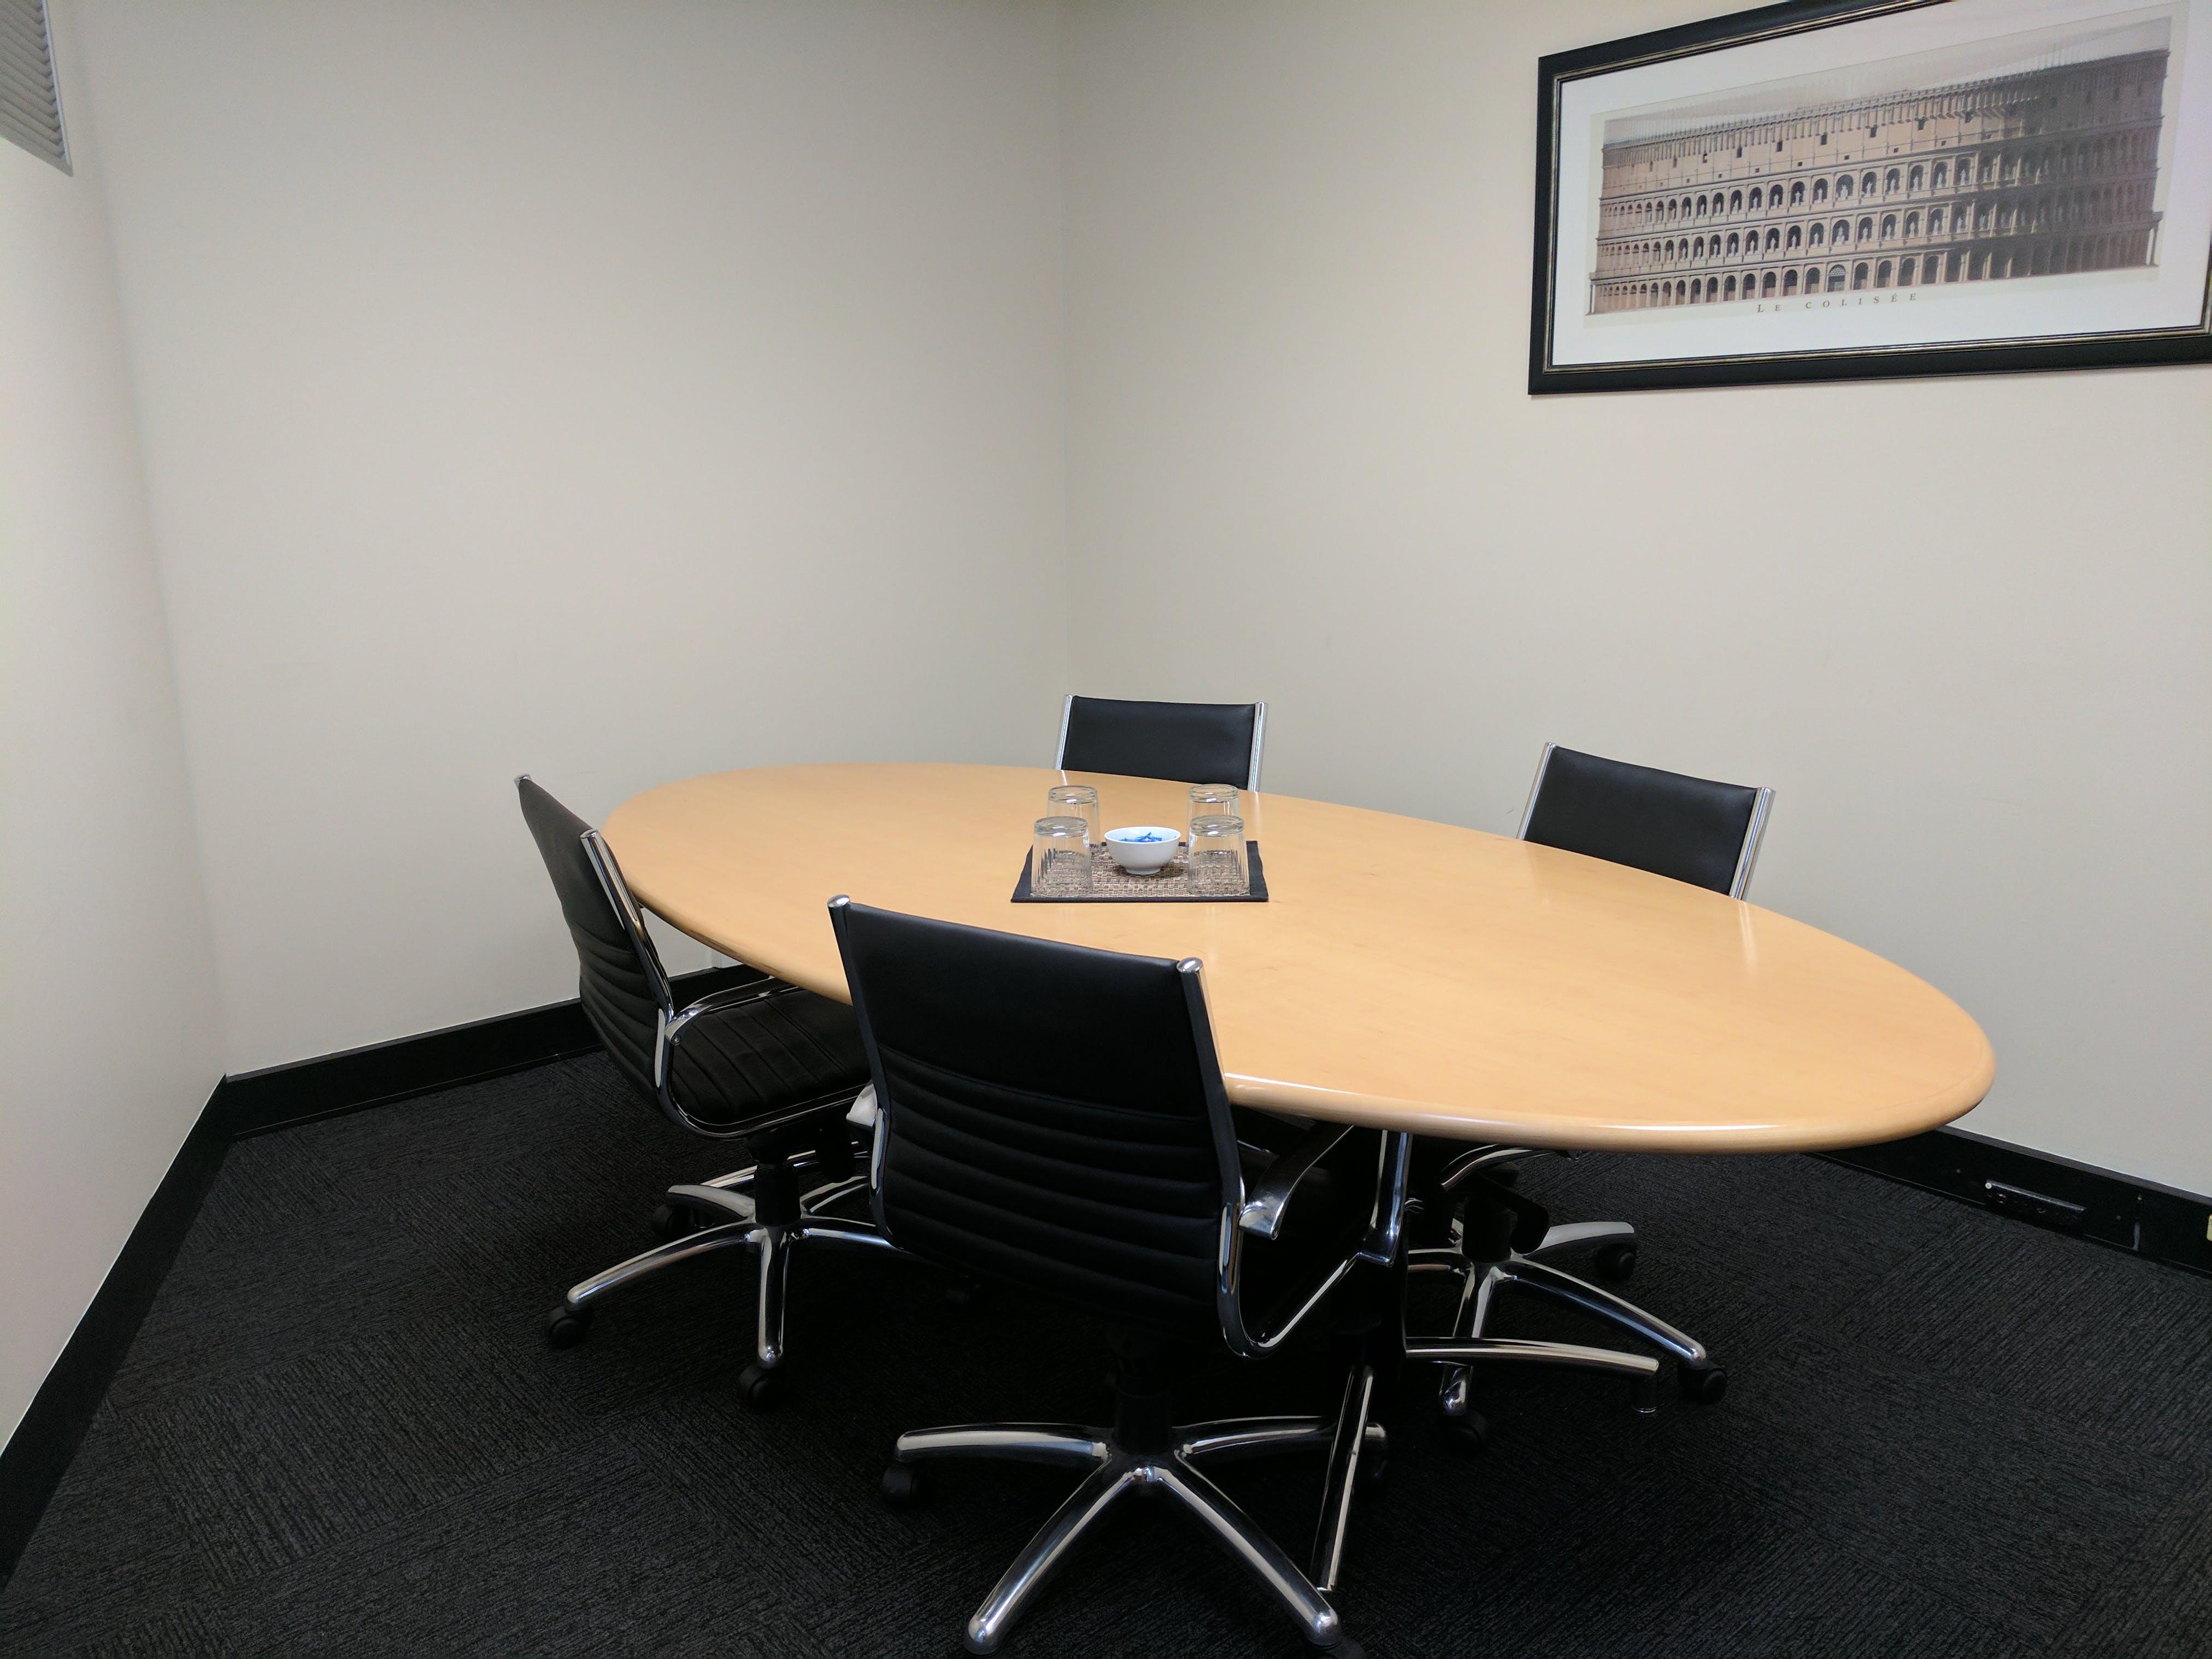 Angas Room, meeting room at Wilkin Group, image 1